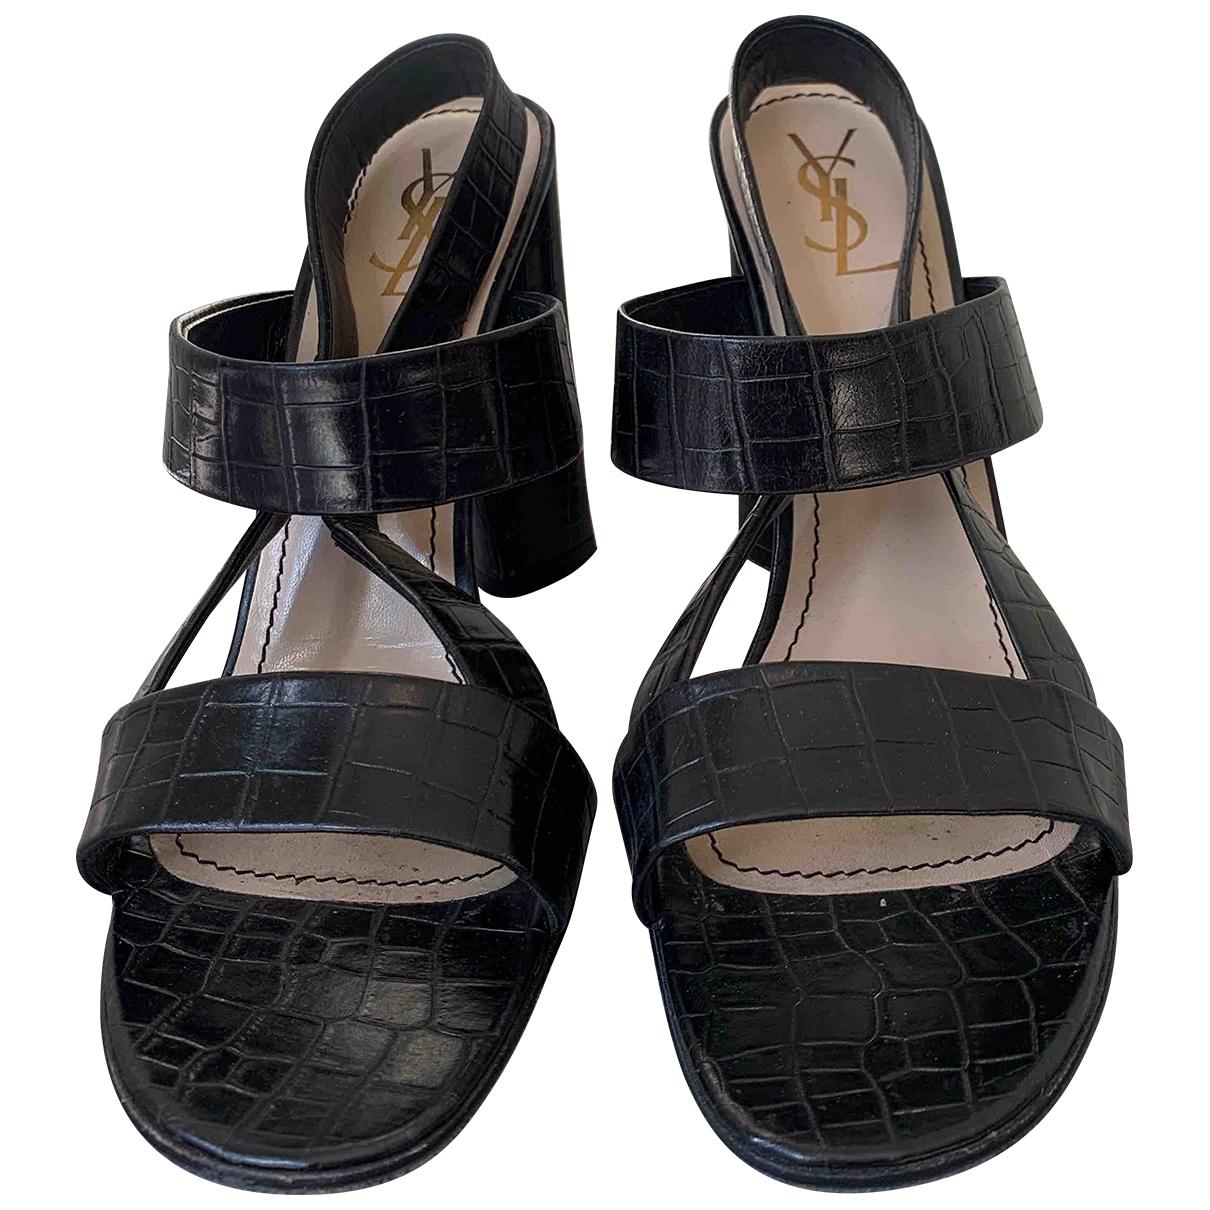 Yves Saint Laurent \N Black Leather Heels for Women 40.5 EU